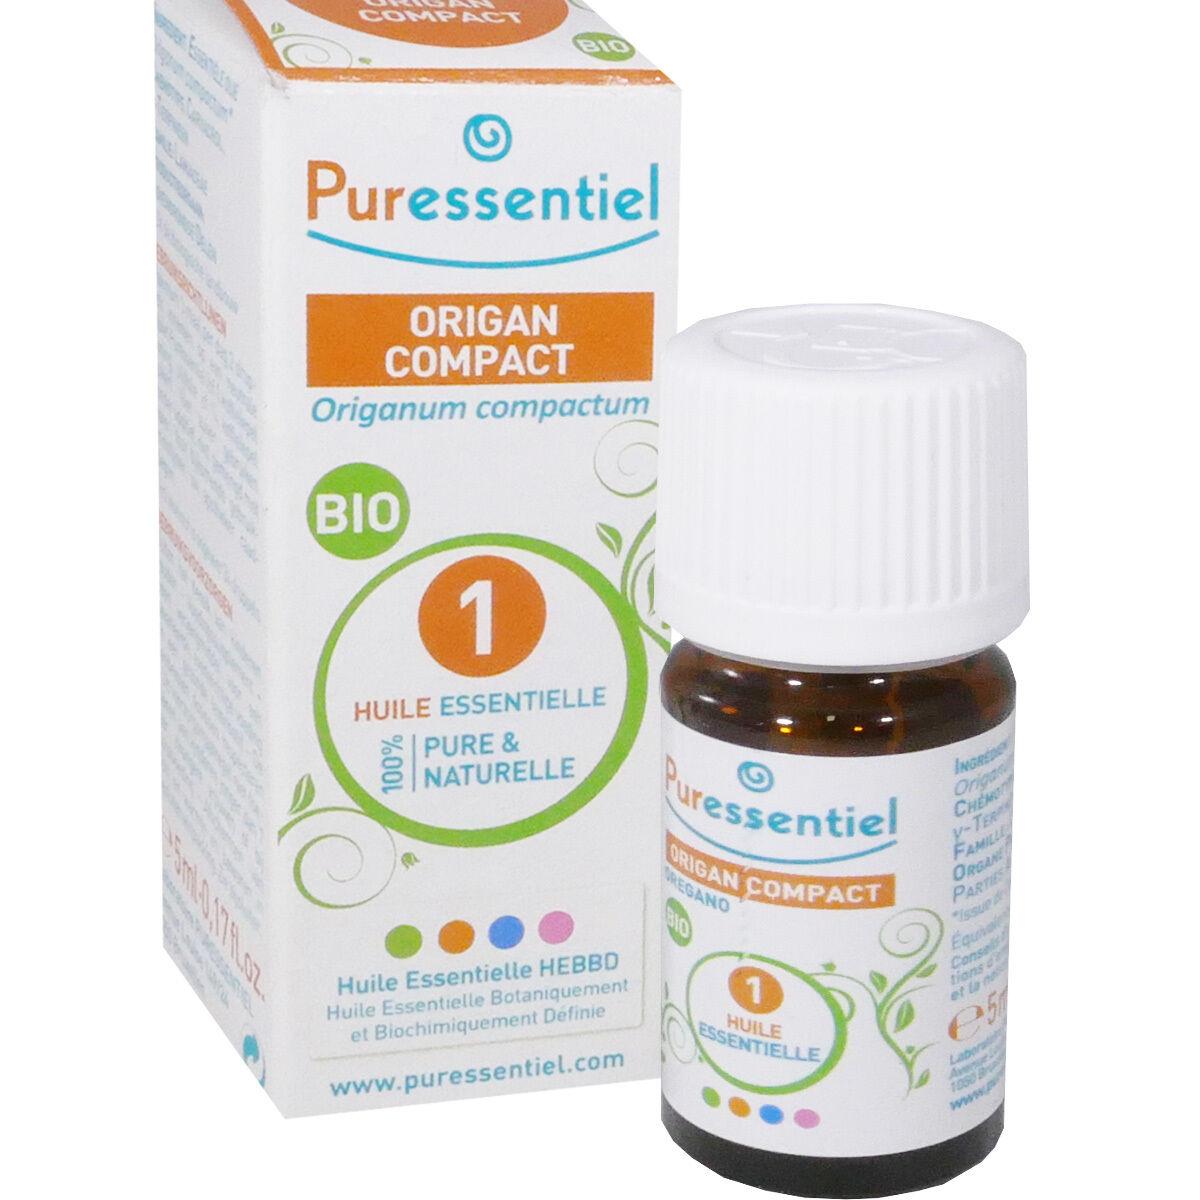 Puressentiel huile essentielle origan compact 5 ml